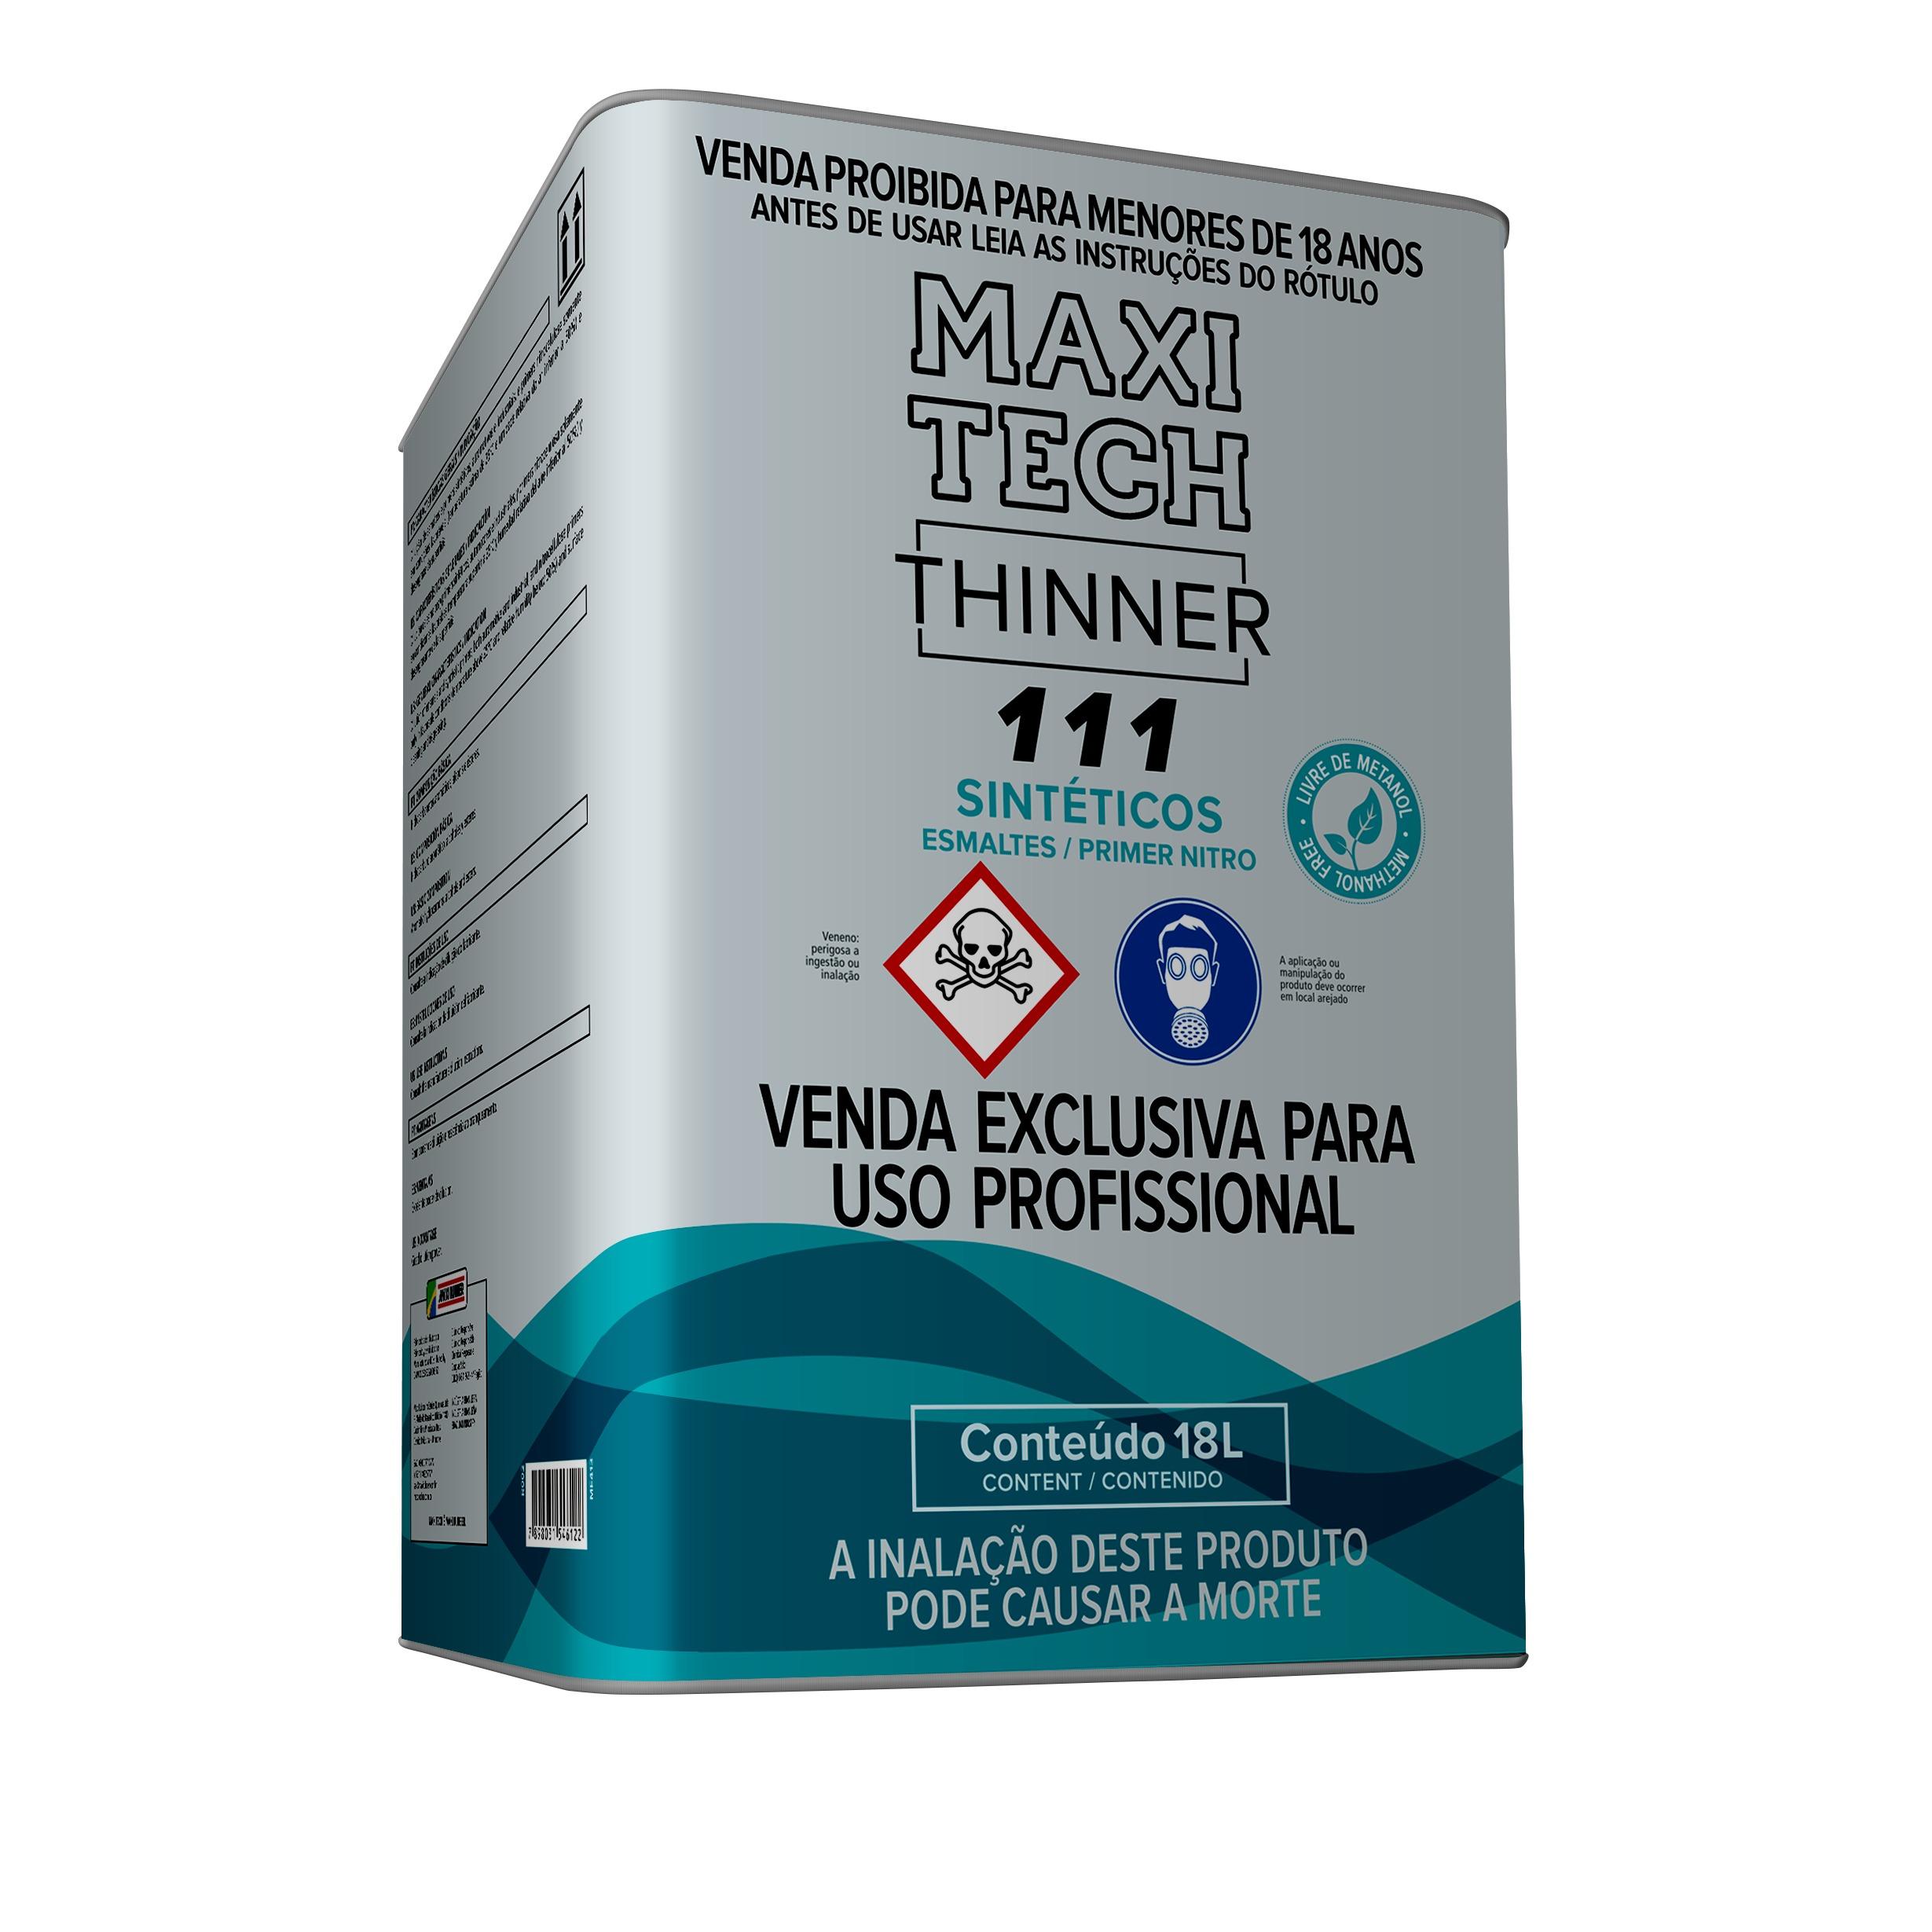 Thinner 111 - Sintético Primer Nitro - 18L